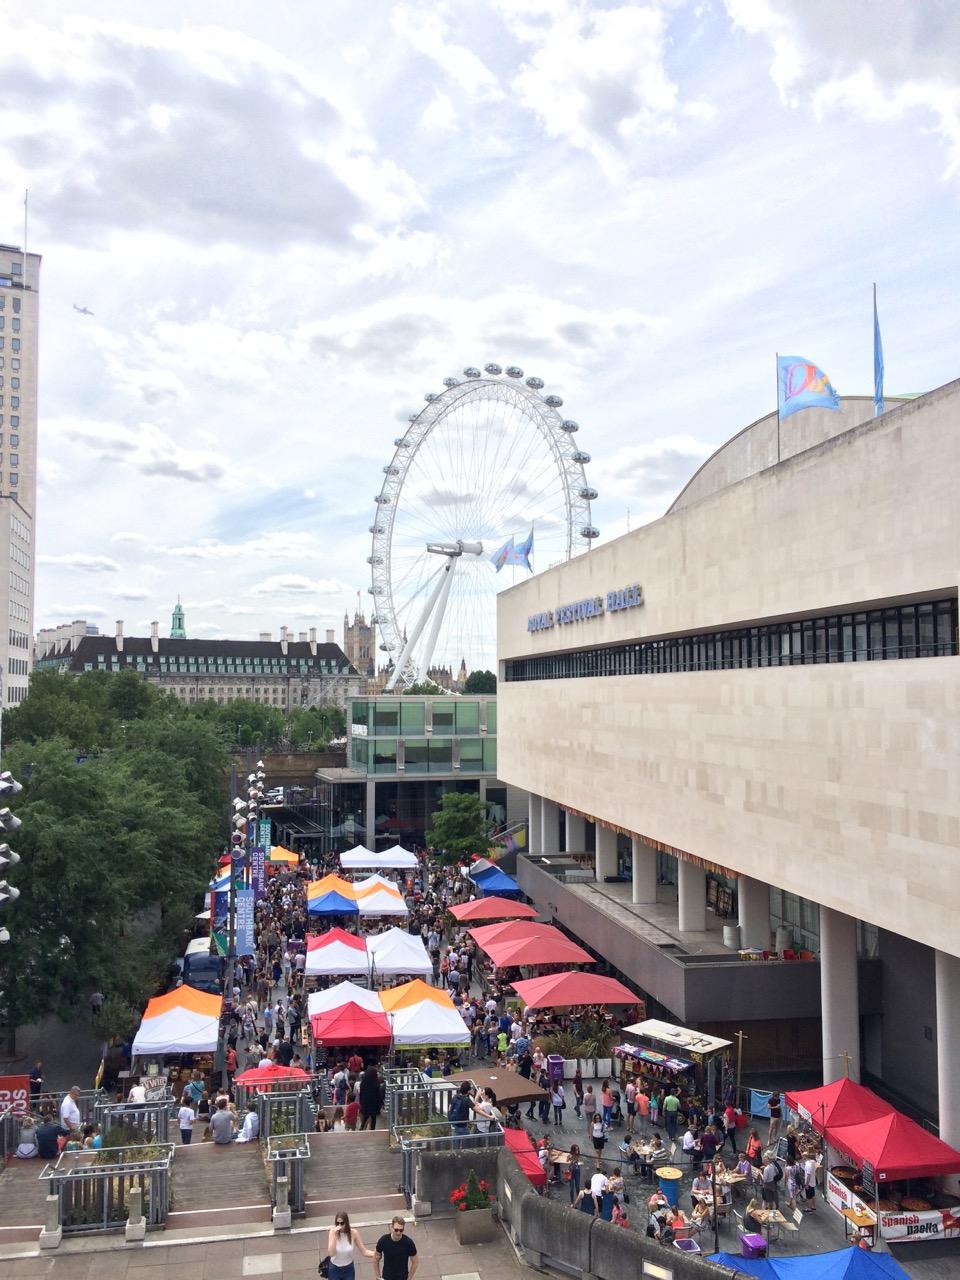 Southbank Centre Market, London